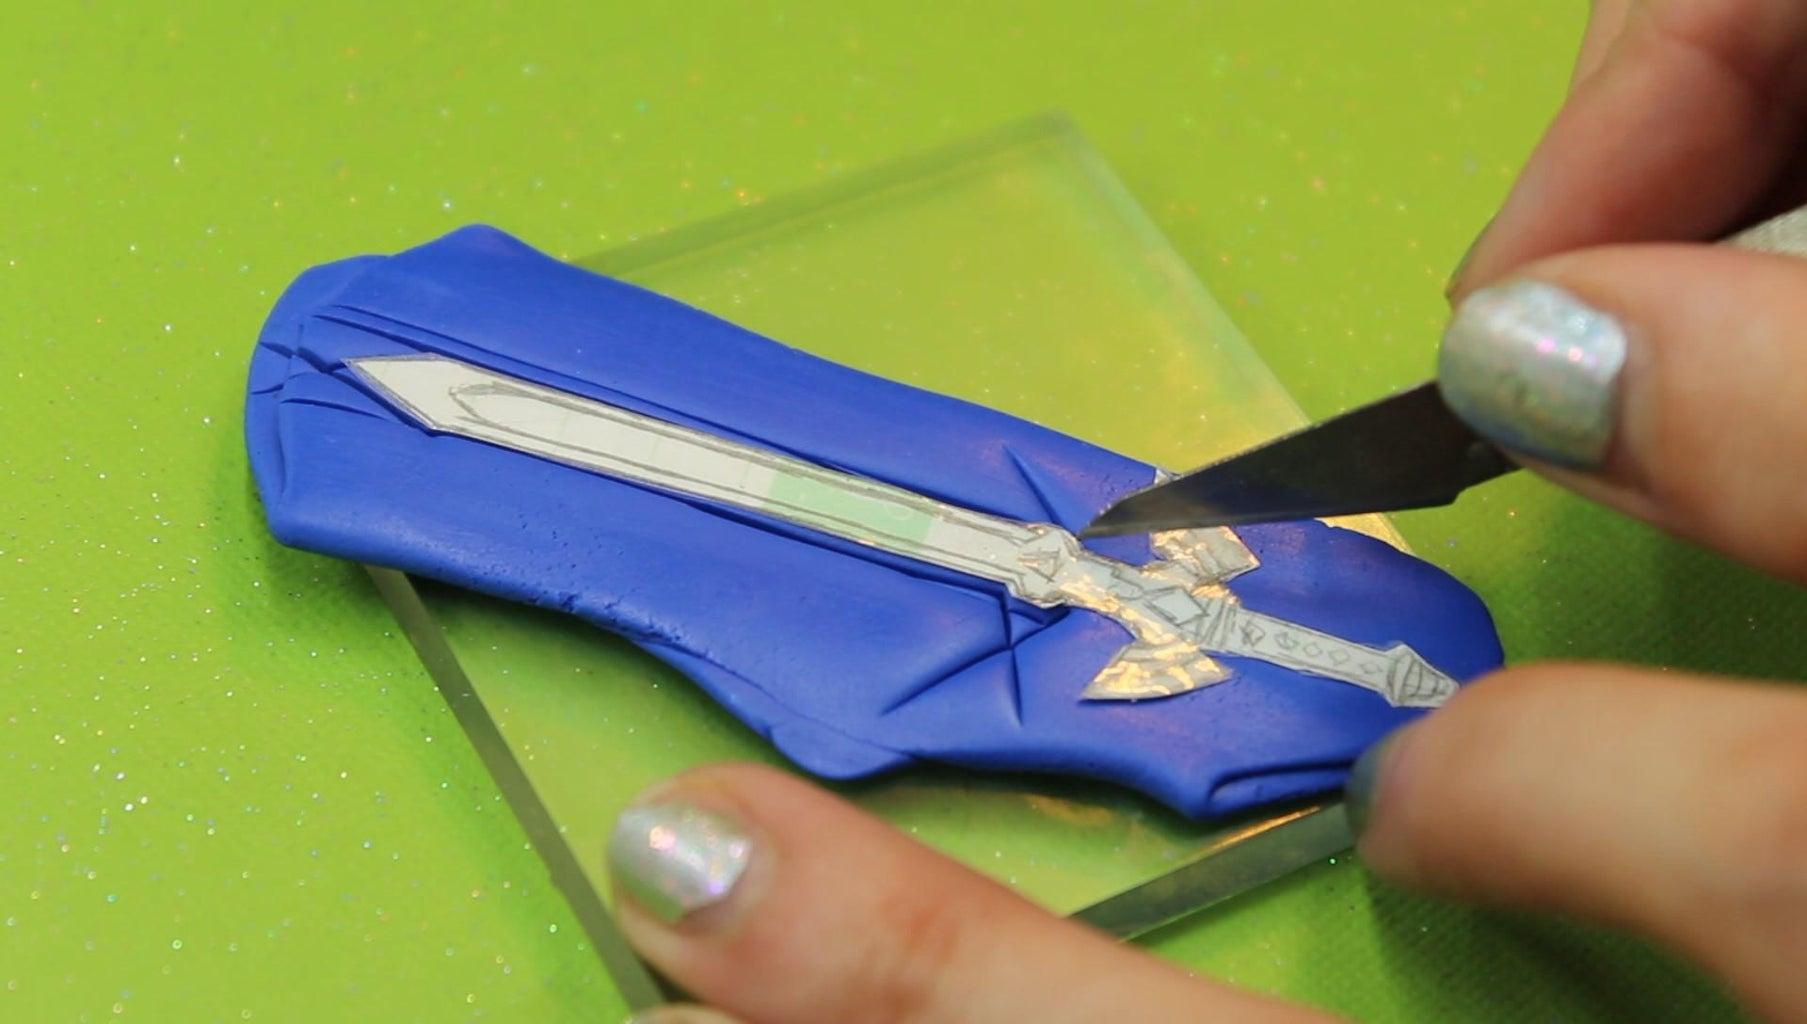 Master Sword: Shaping